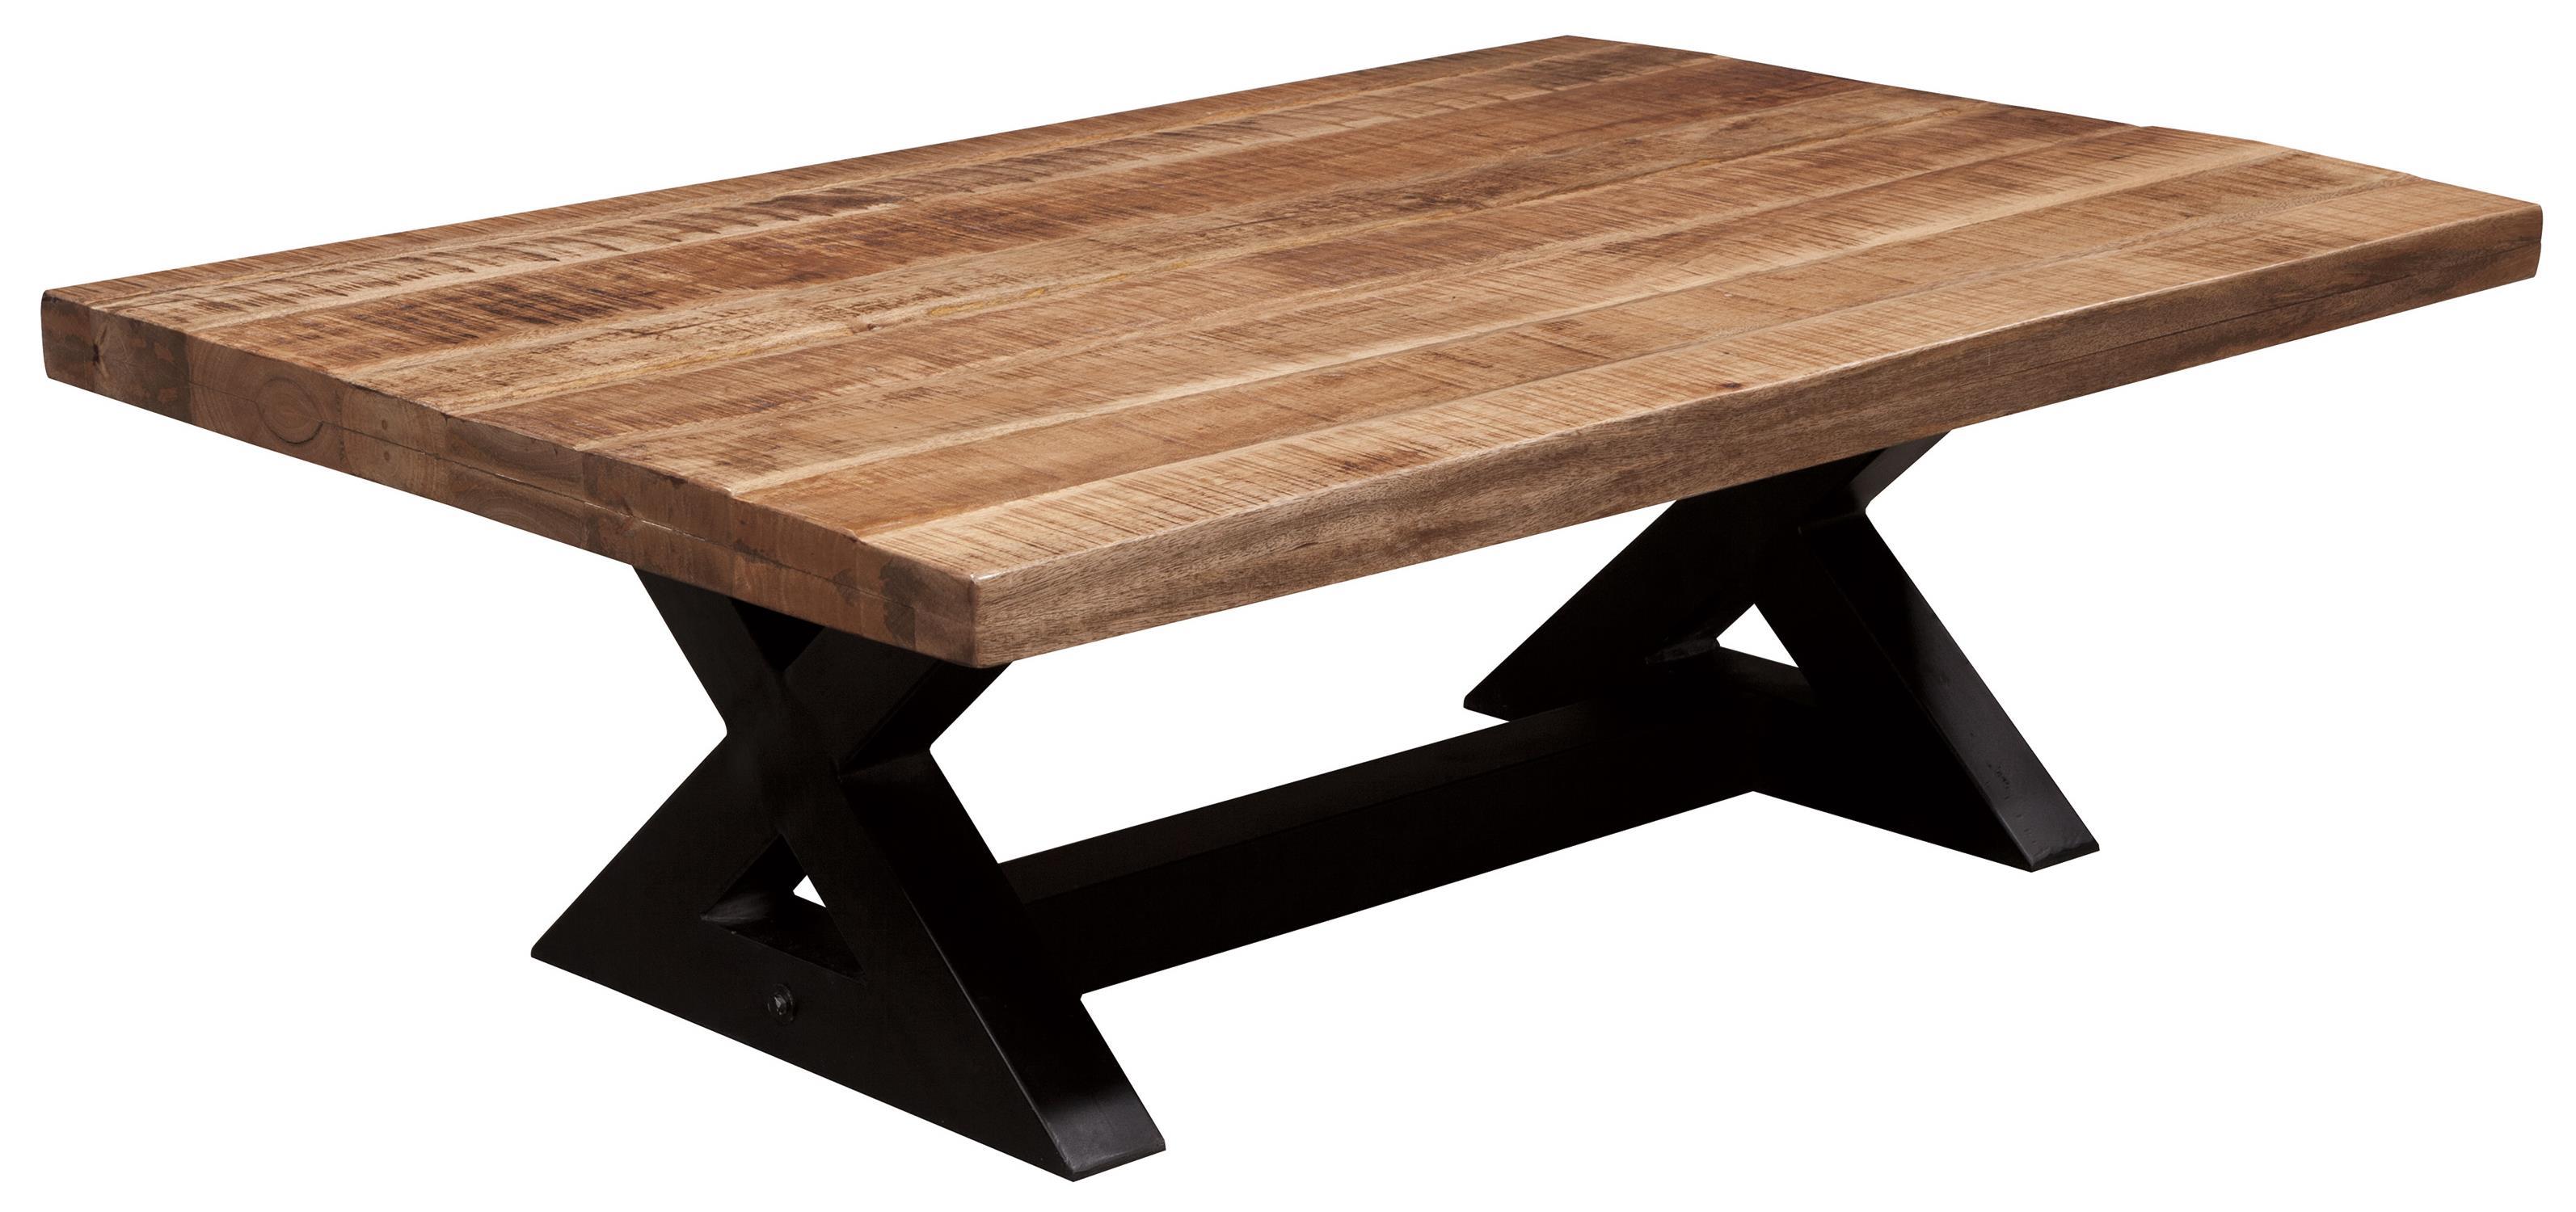 Rectangular Cocktail Table with Mango Wood Top & Metal X-Braced Base